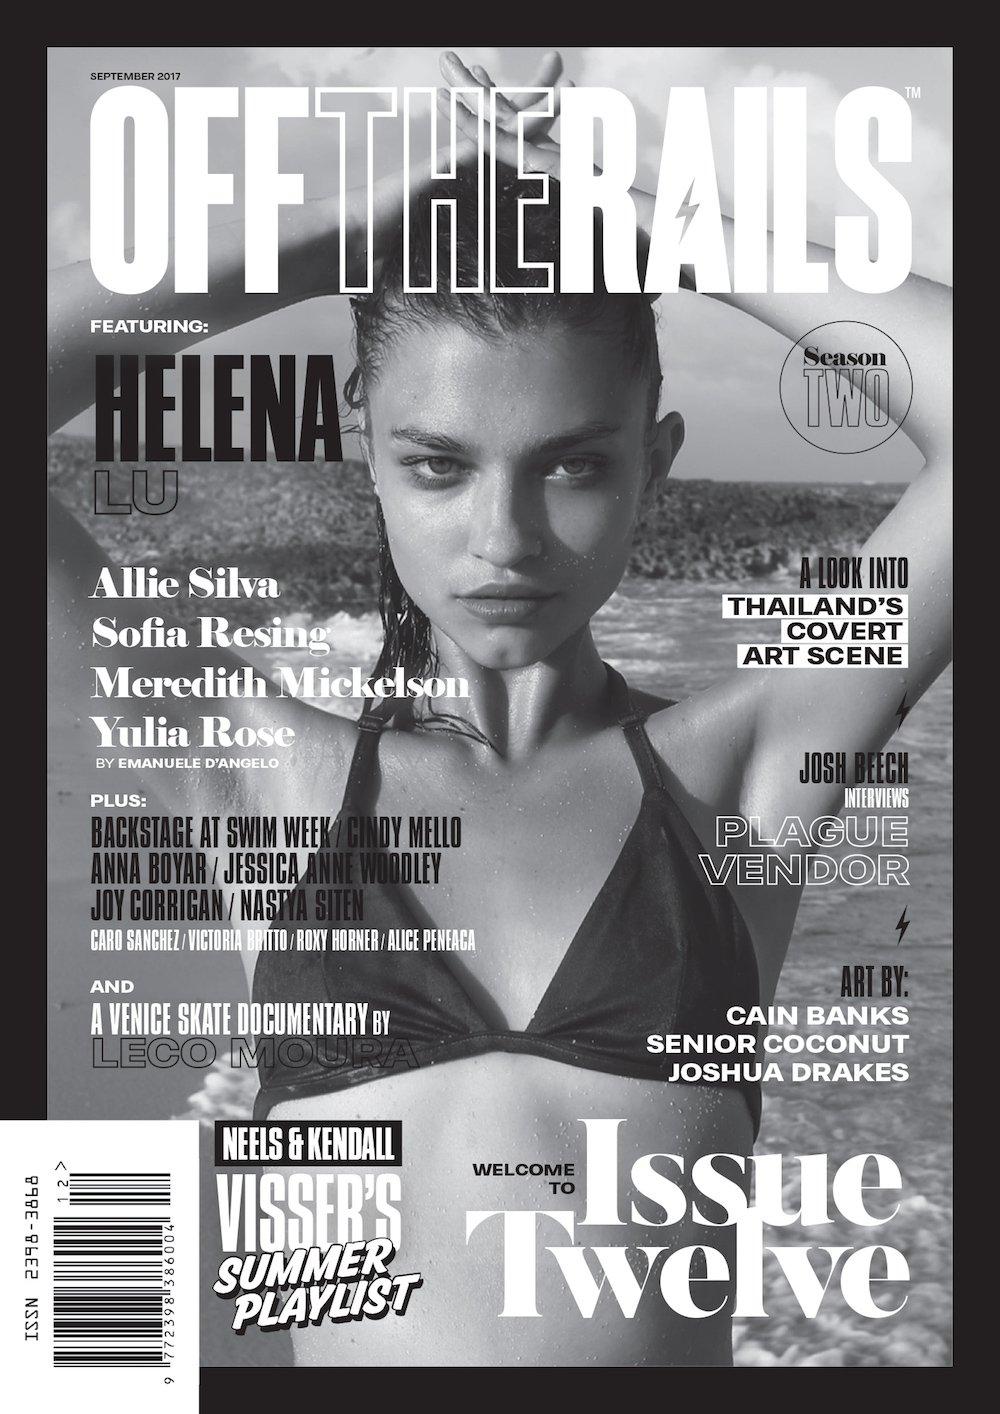 OFF THE RAILS MAGAZINE ISSUE 12 - September '17